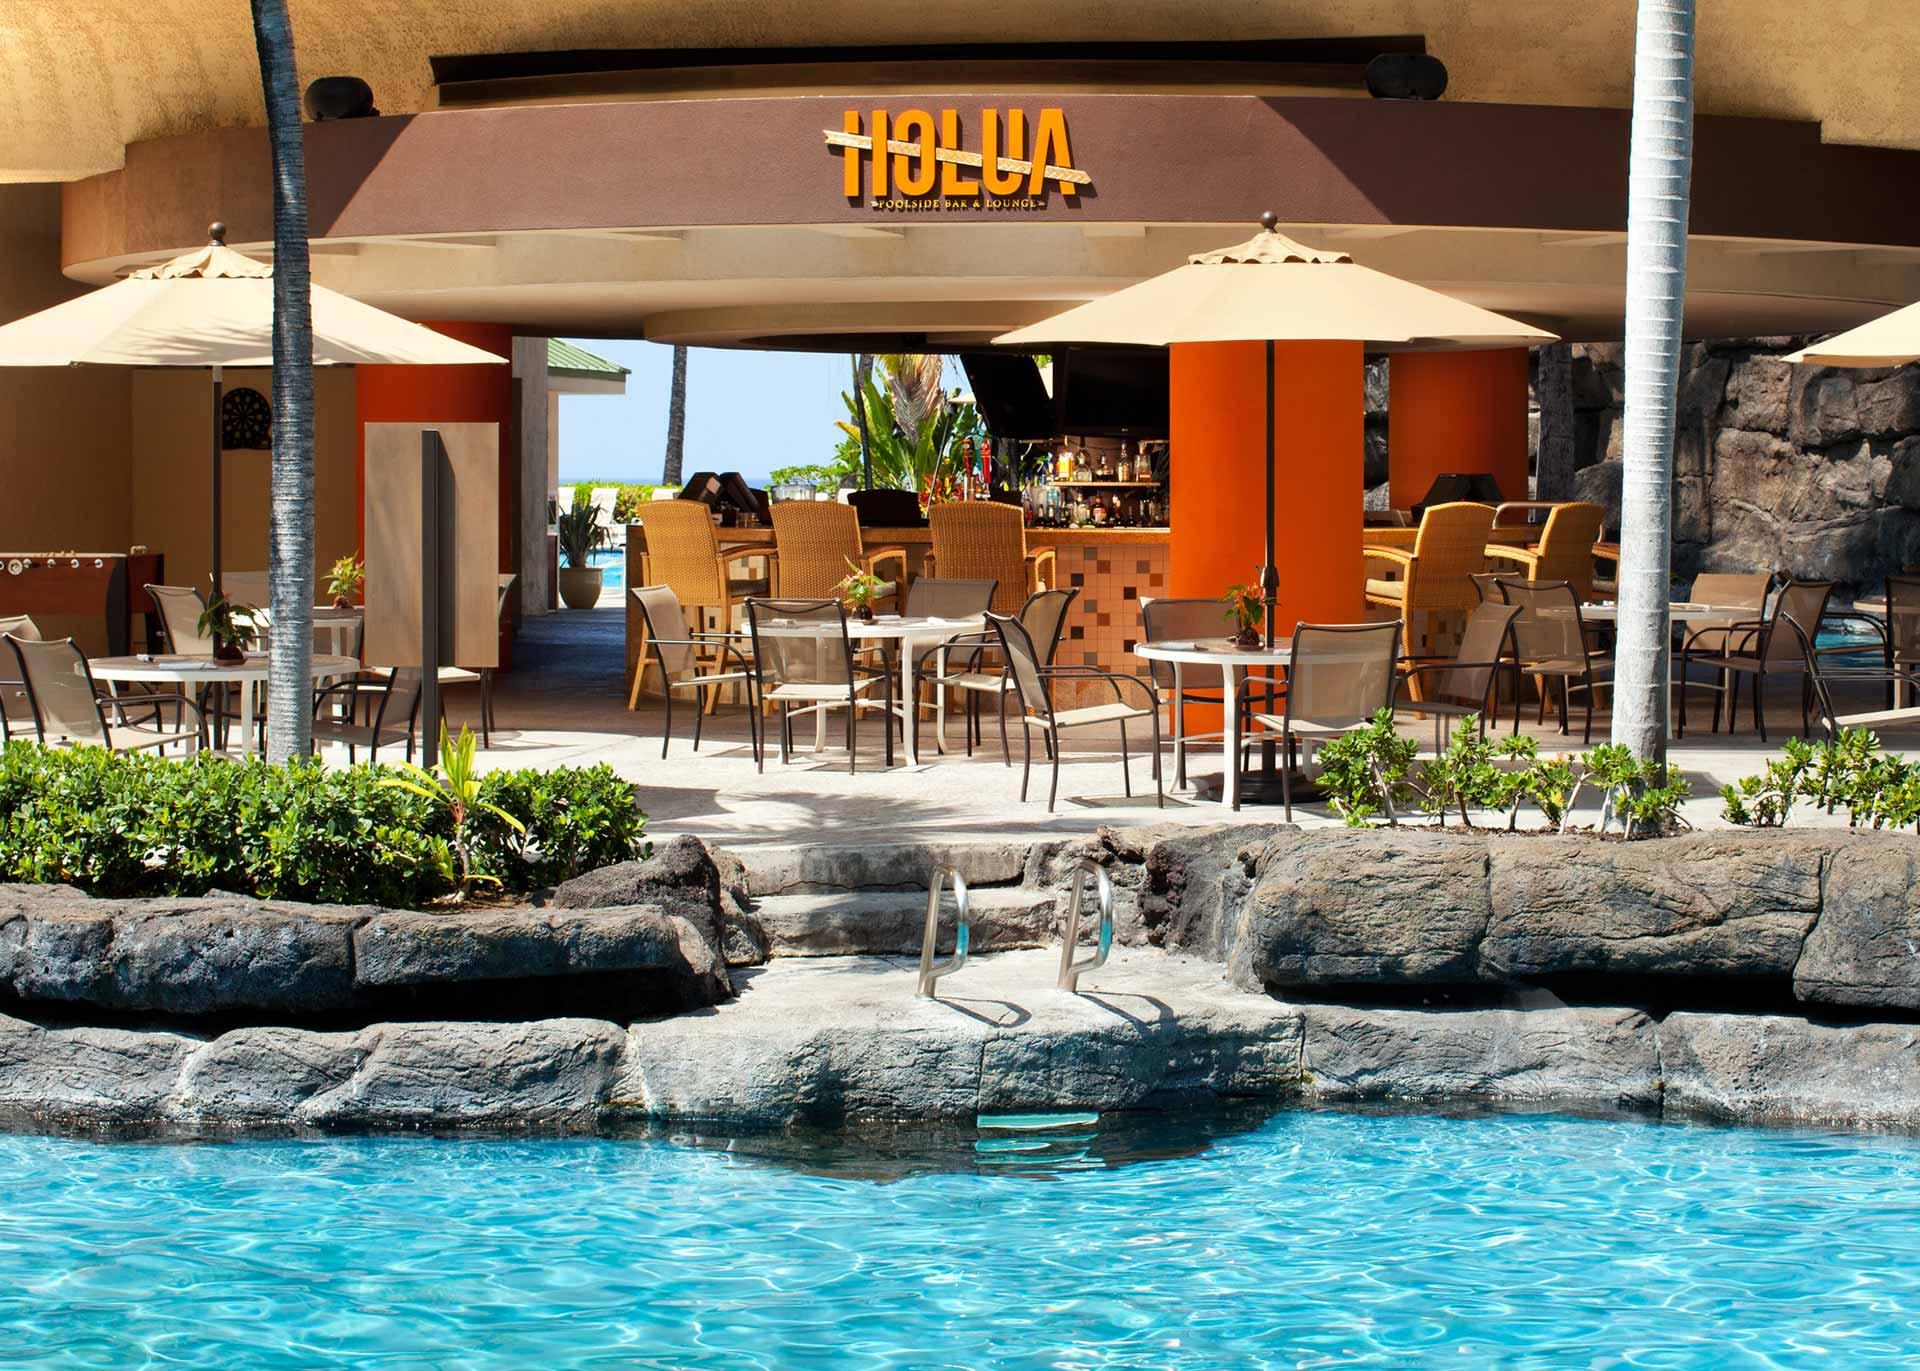 Holua facade and swimming pool